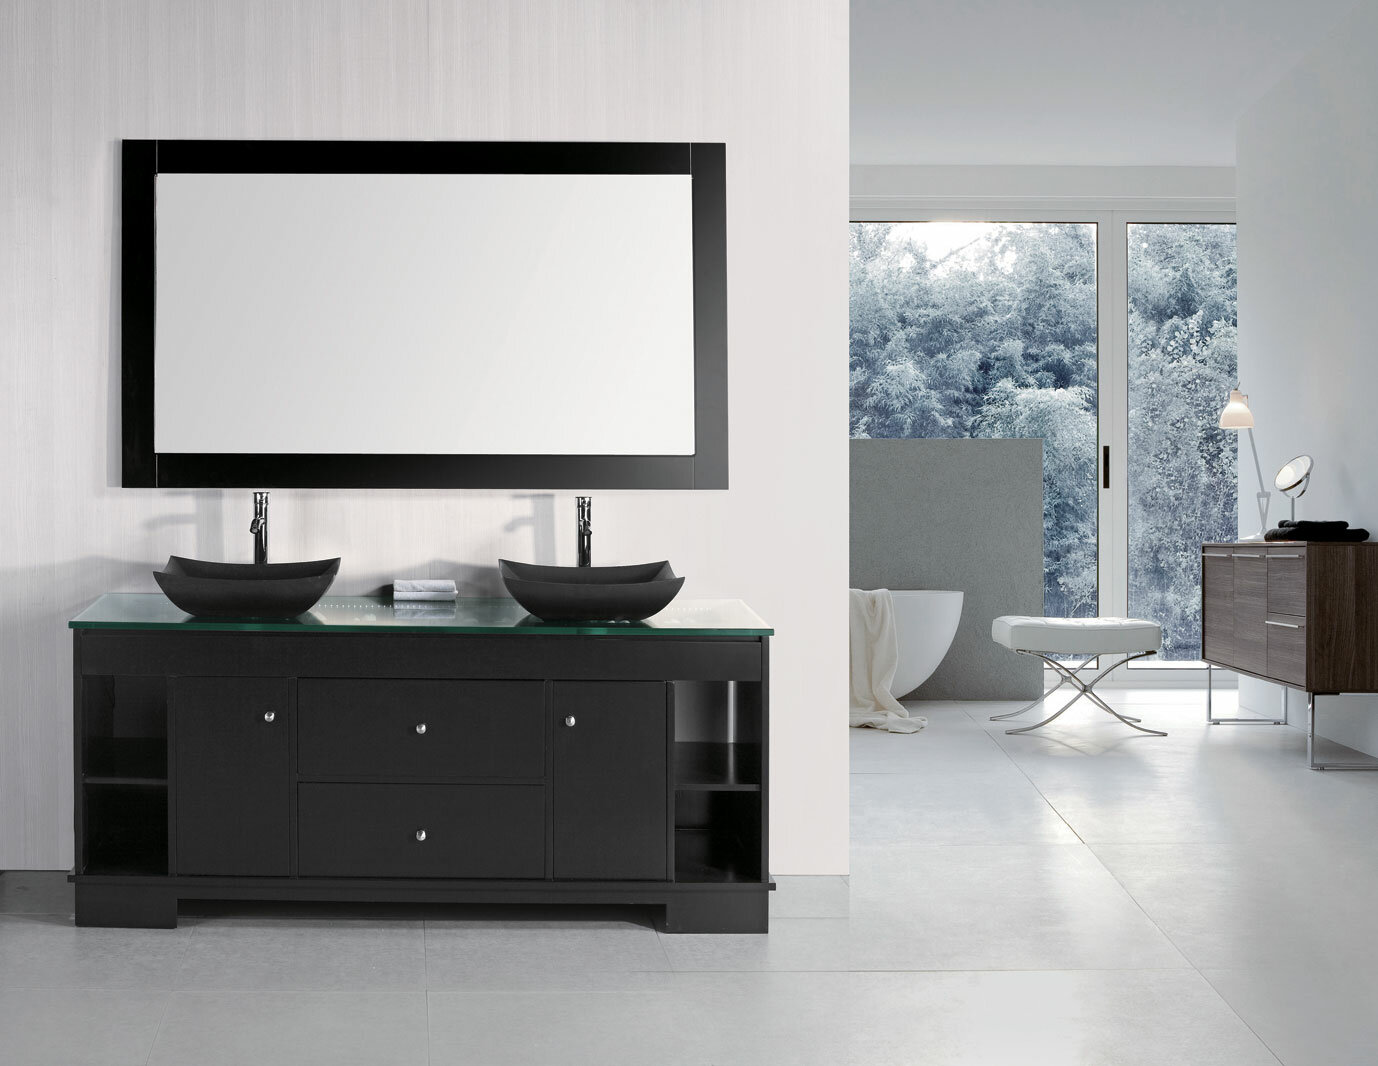 Dcor Design Penton 72 Double Bathroom Vanity Set With Mirror Reviews Wayfair